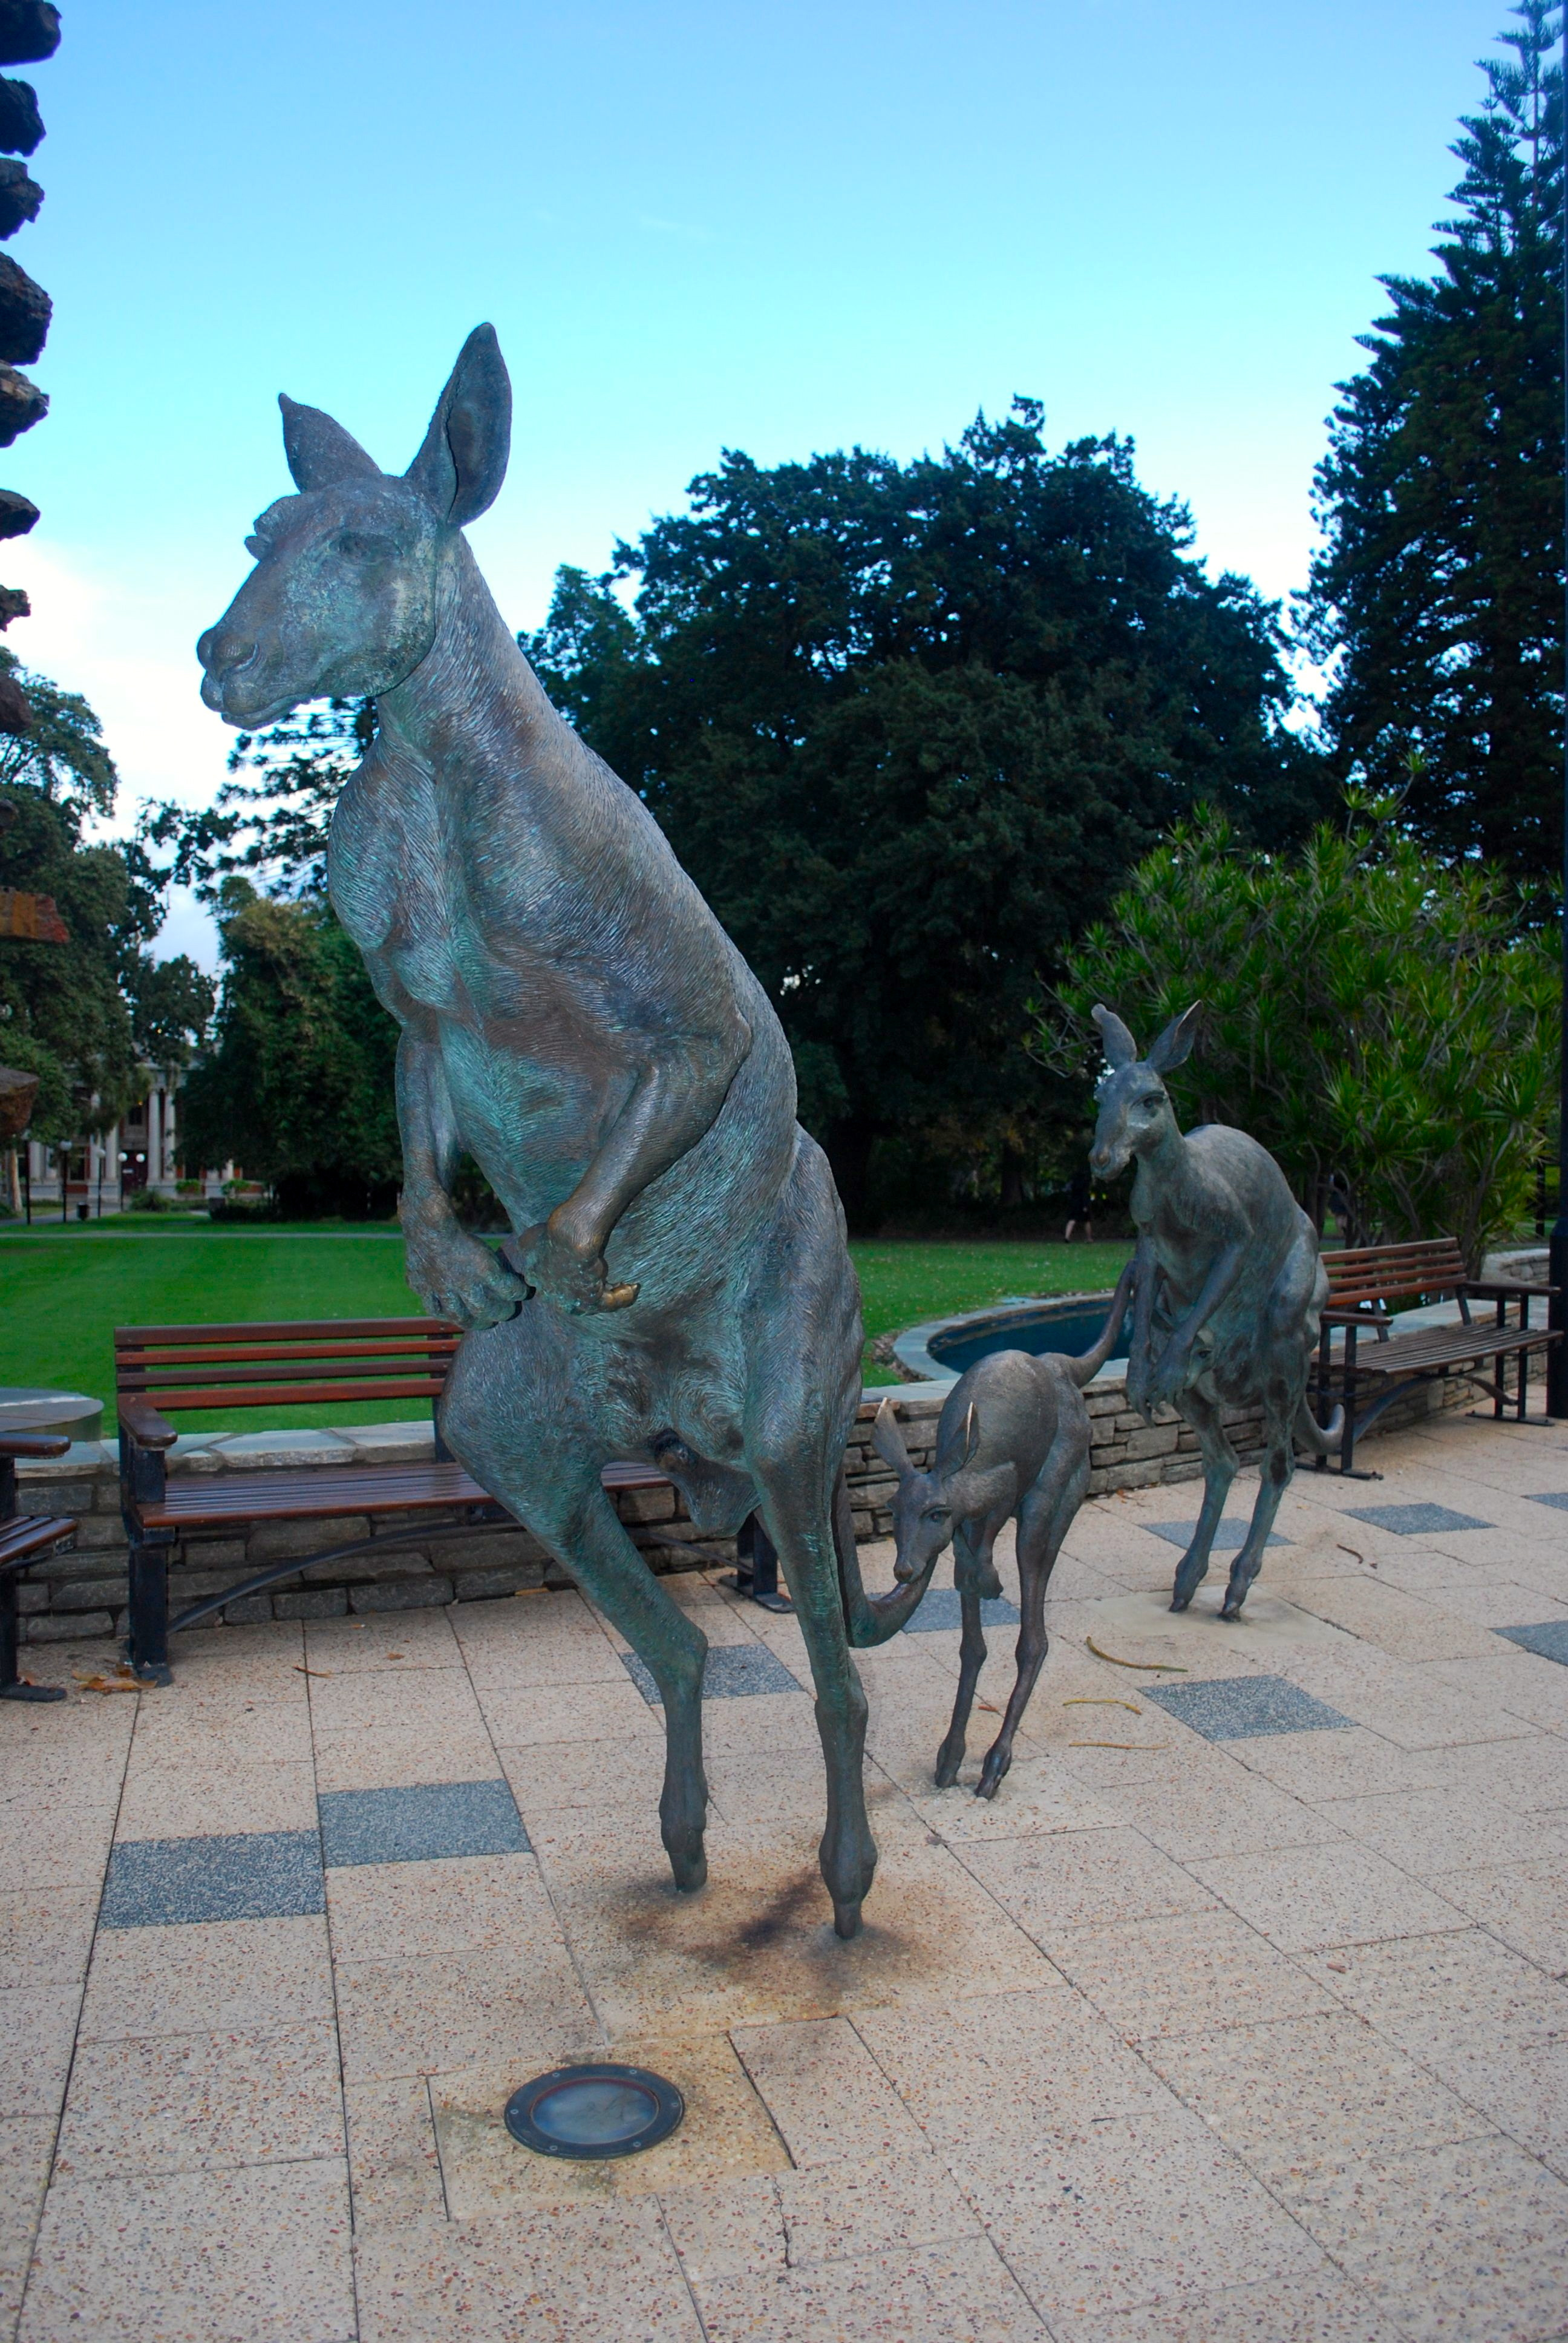 Kangaroo statues in Perth, Australia